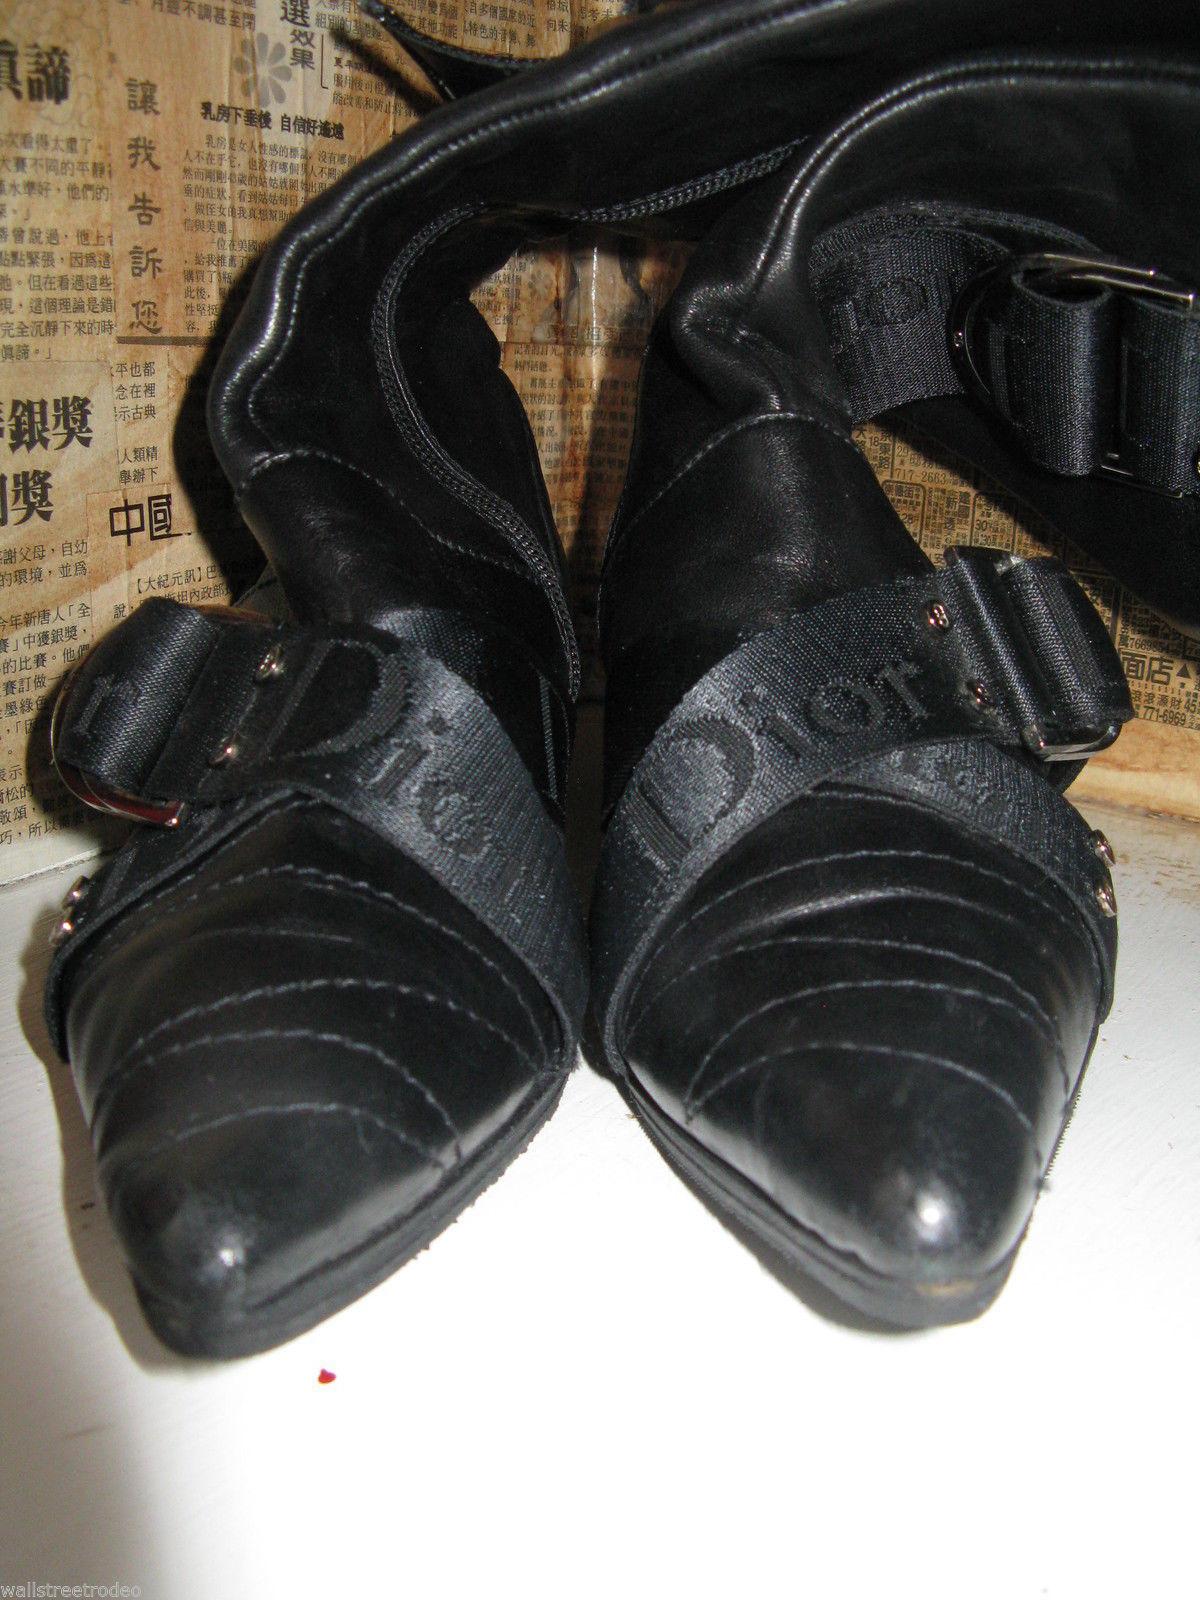 Dior biker logo quilted butter leather motorcylce punk runway boots 6 36 UK3.5 image 4